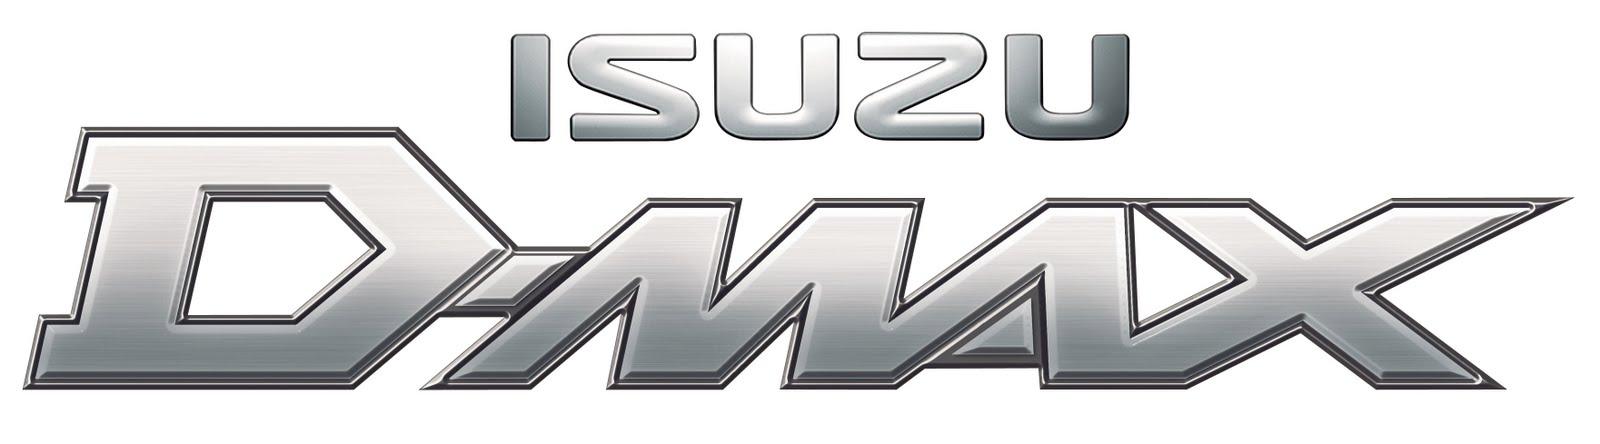 Marketing 3 0 : Bringing a facelift to life| Isuzu D-Max